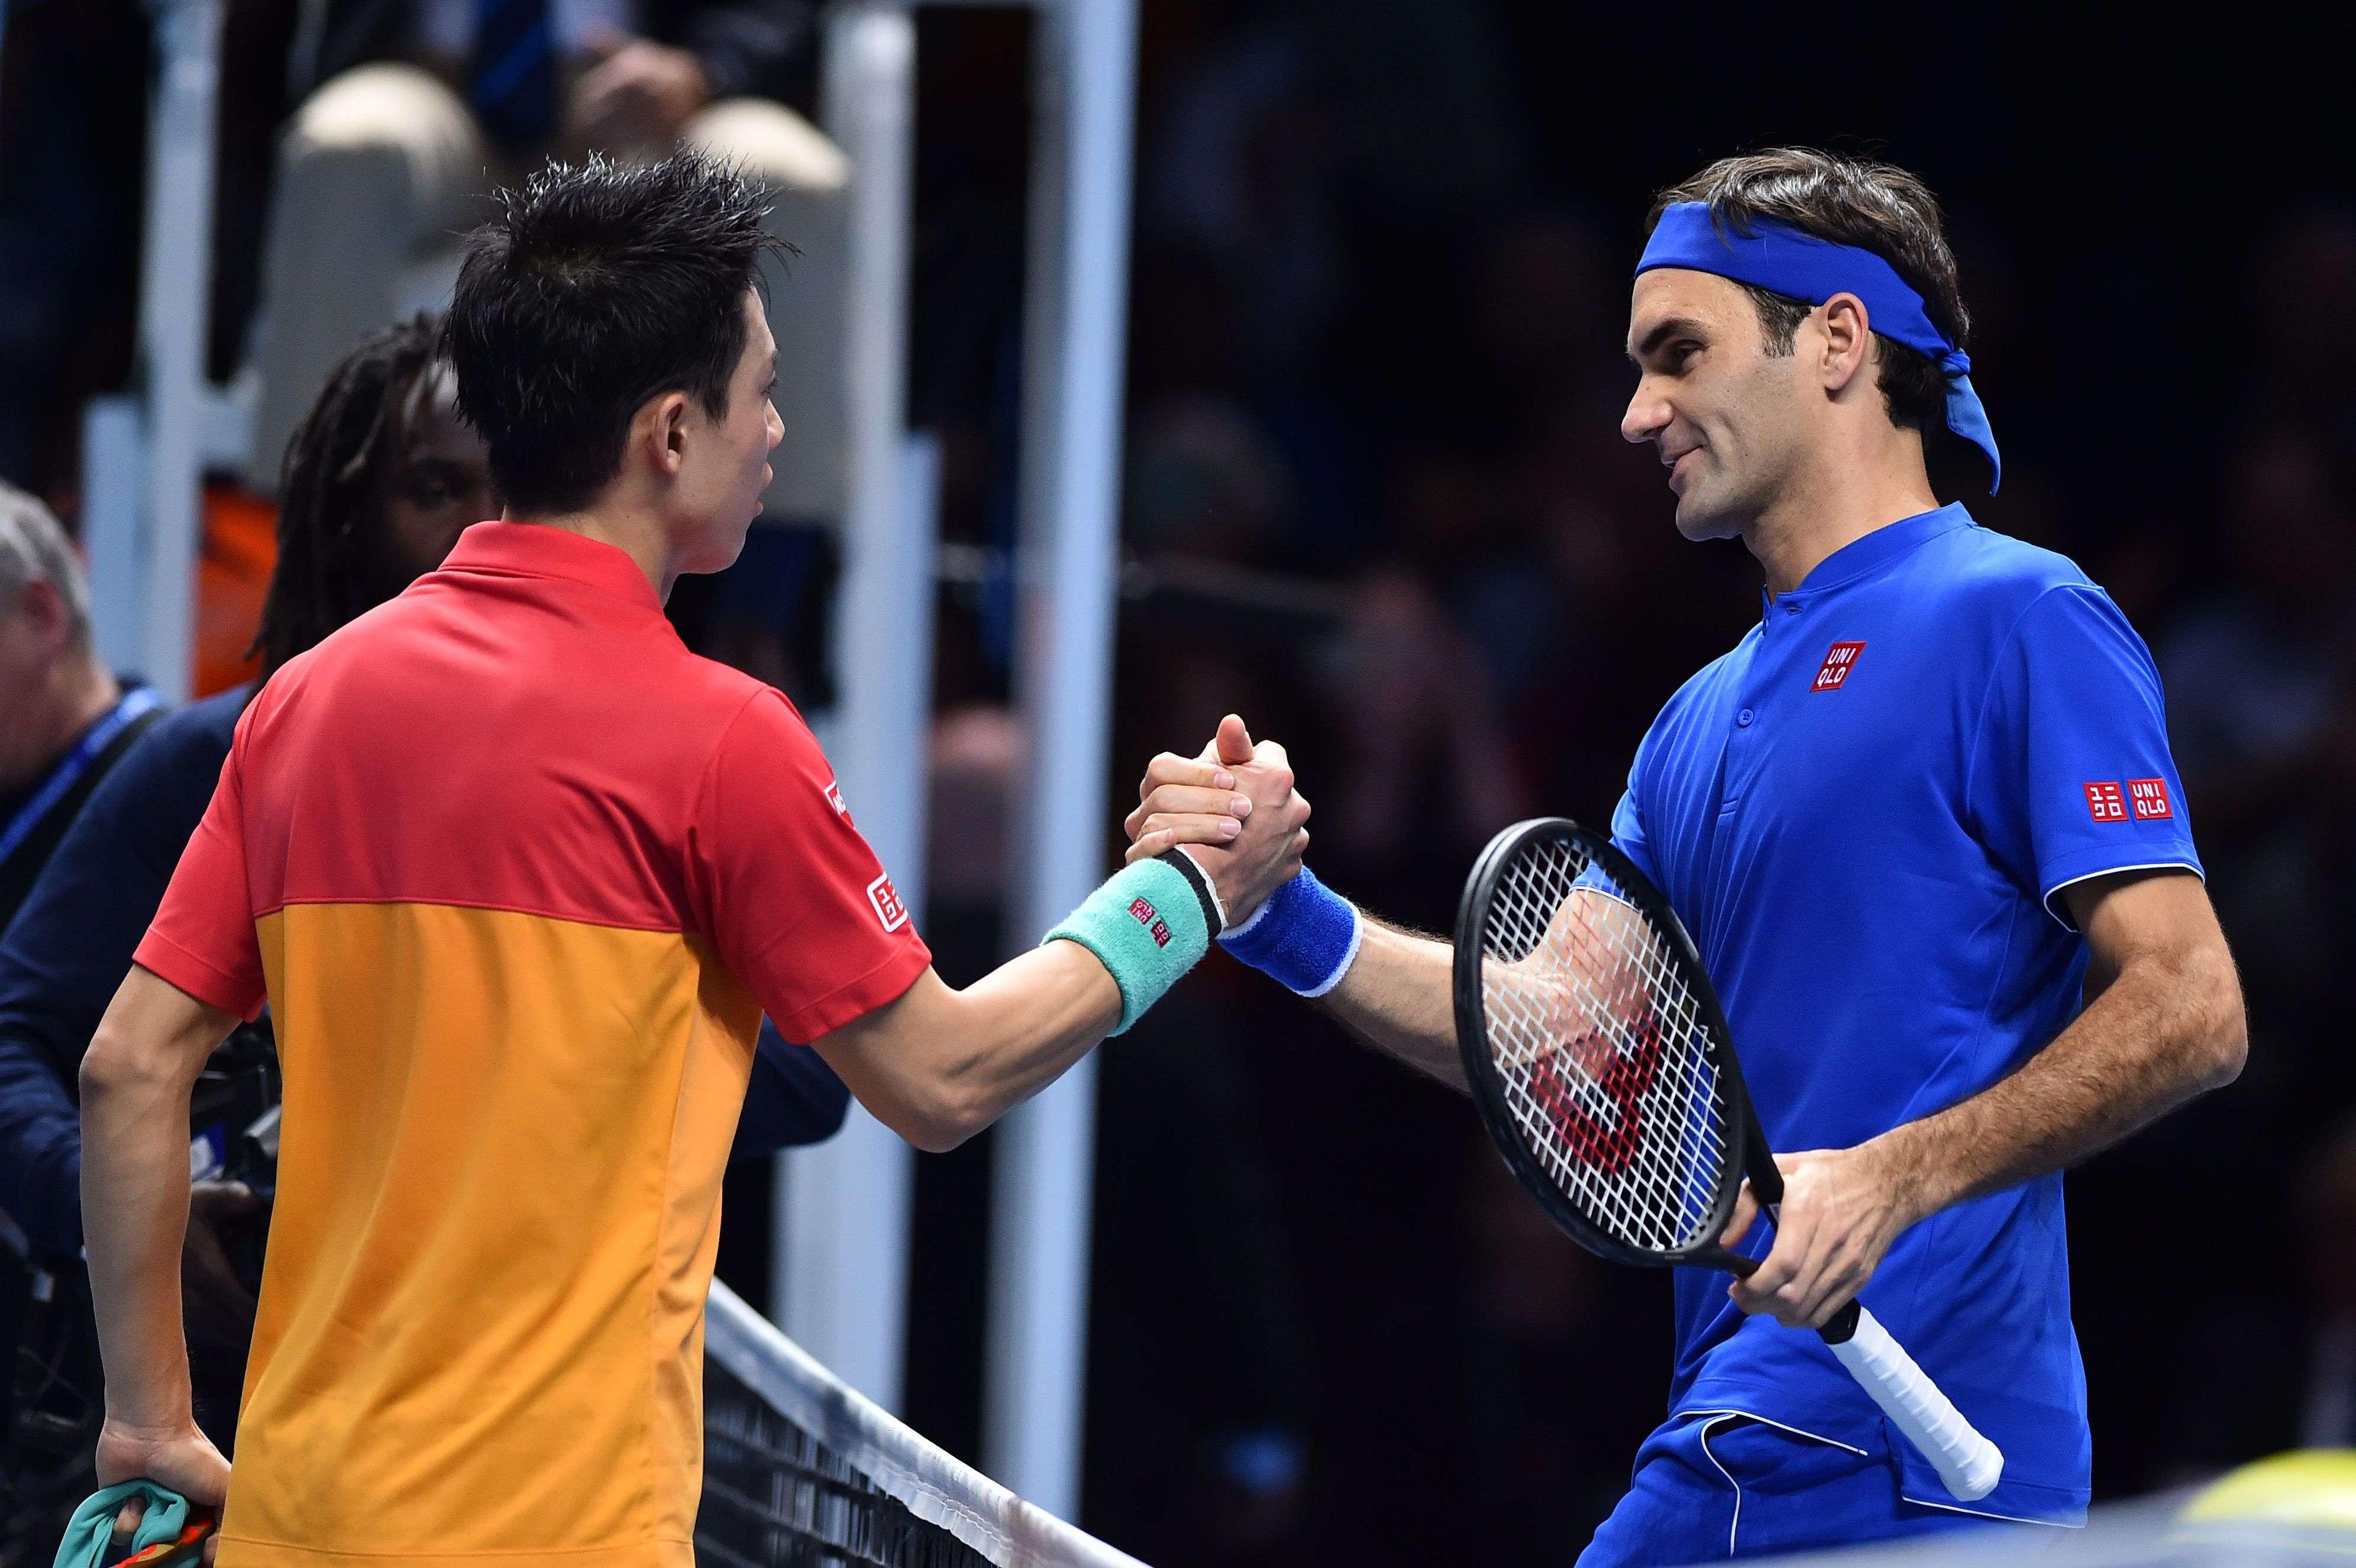 federer-loses-to-nishikori-in-atp-finals-opener